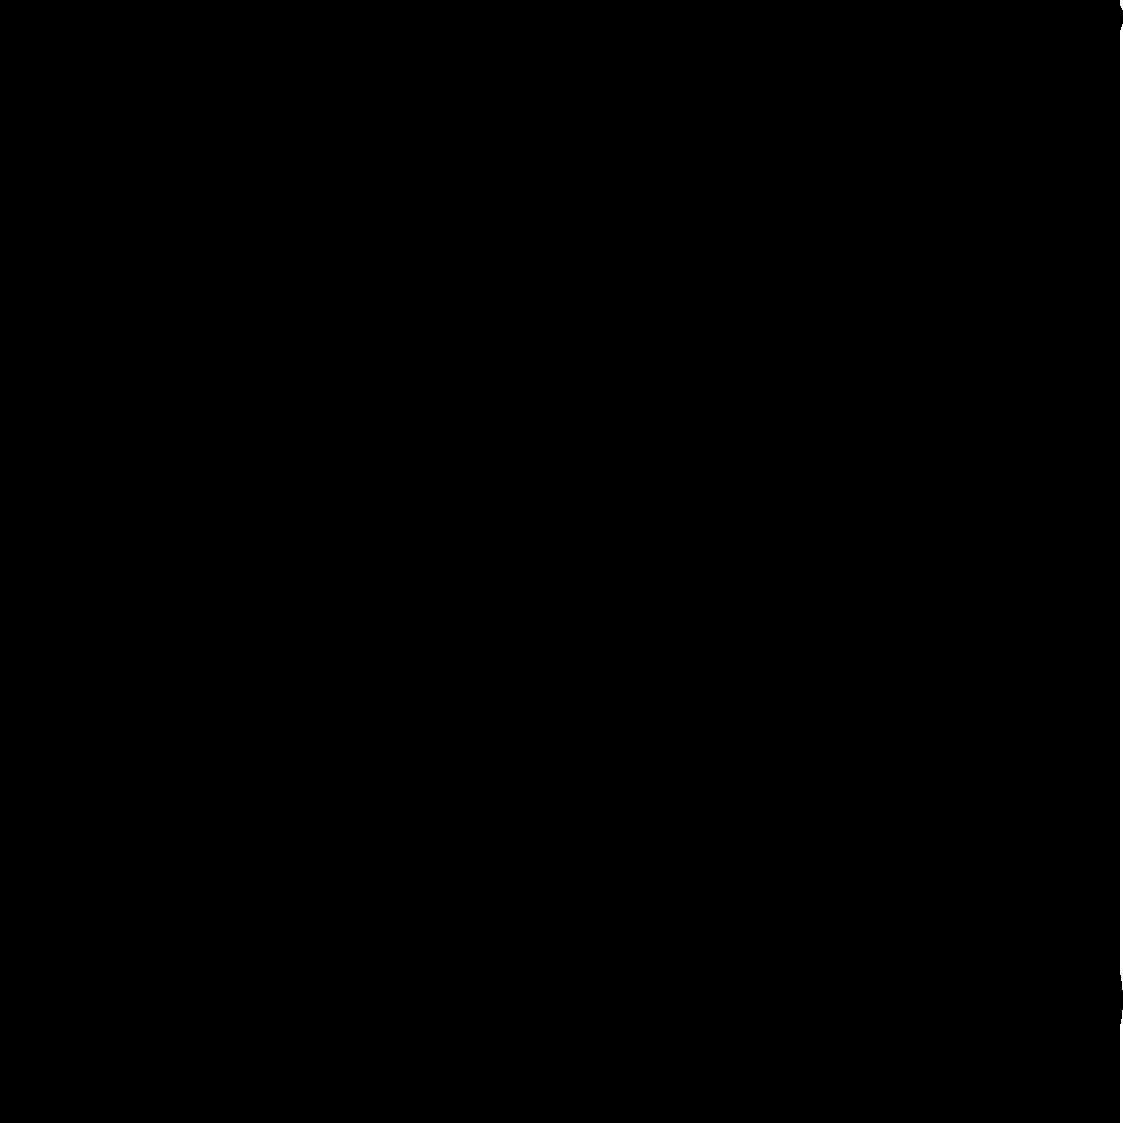 PENCIL-CROP-black.png